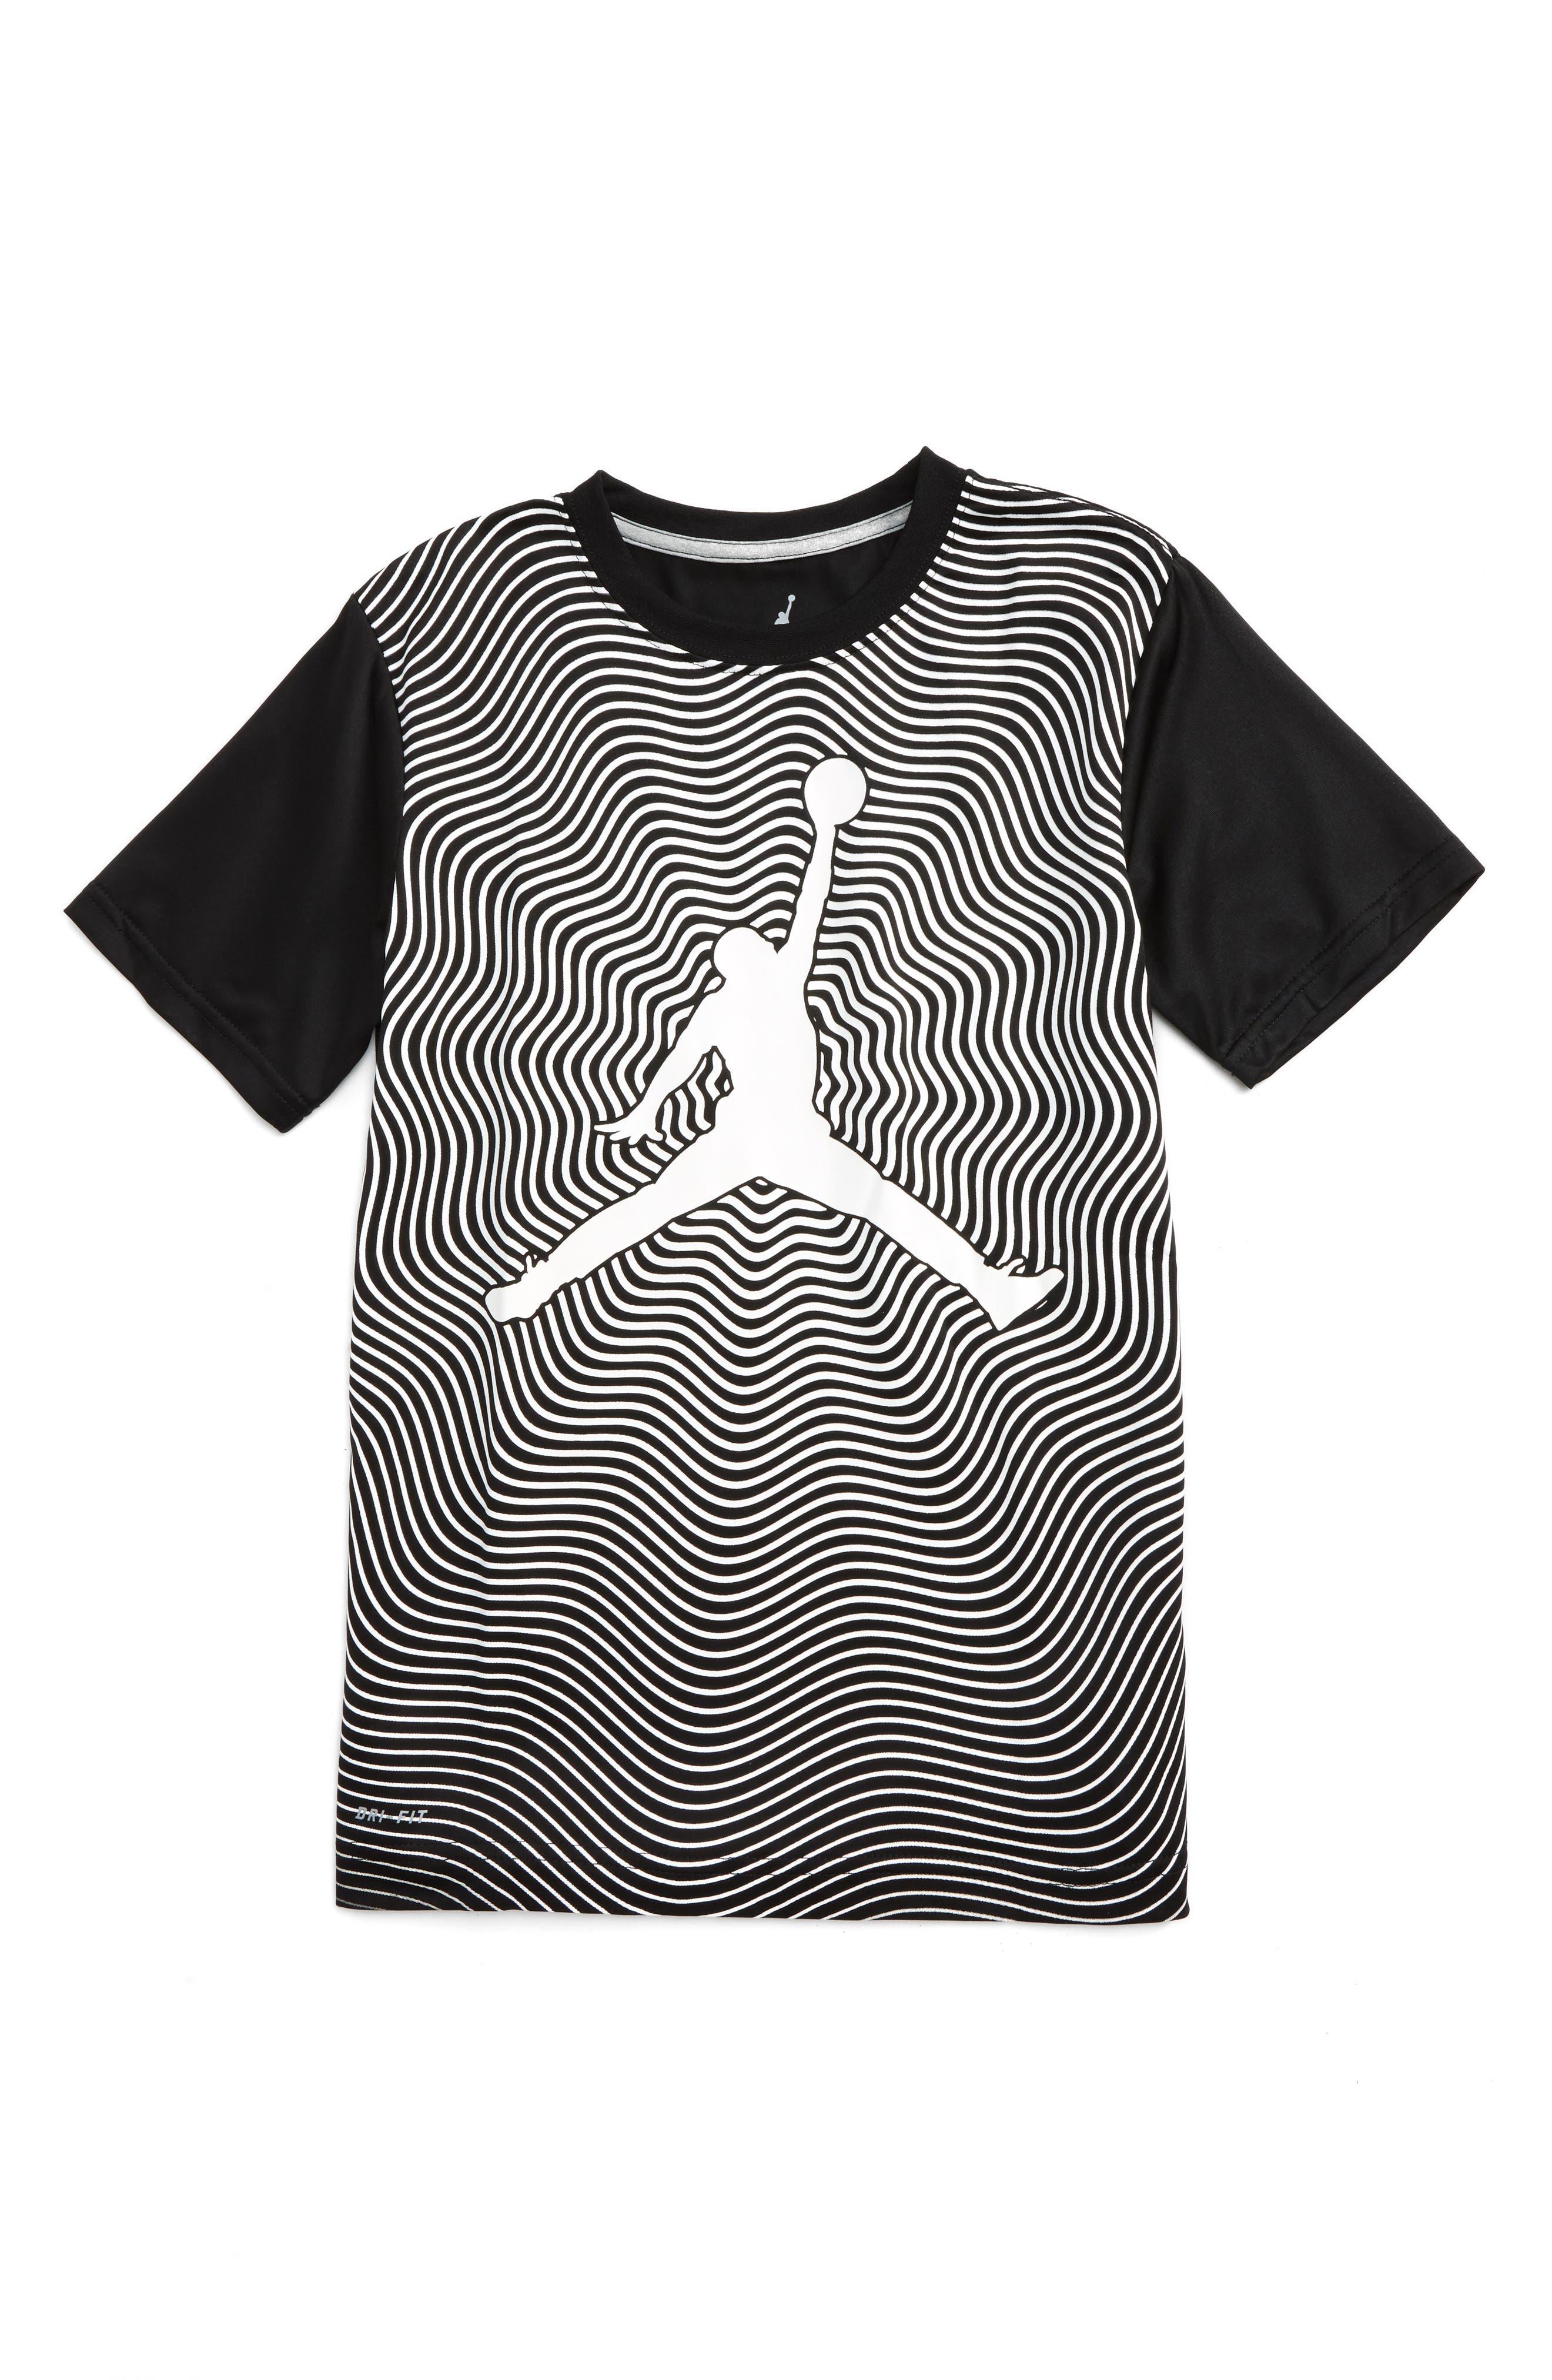 Jordan In the Flow Graphic Dri-FIT T-Shirt (Big Boys)